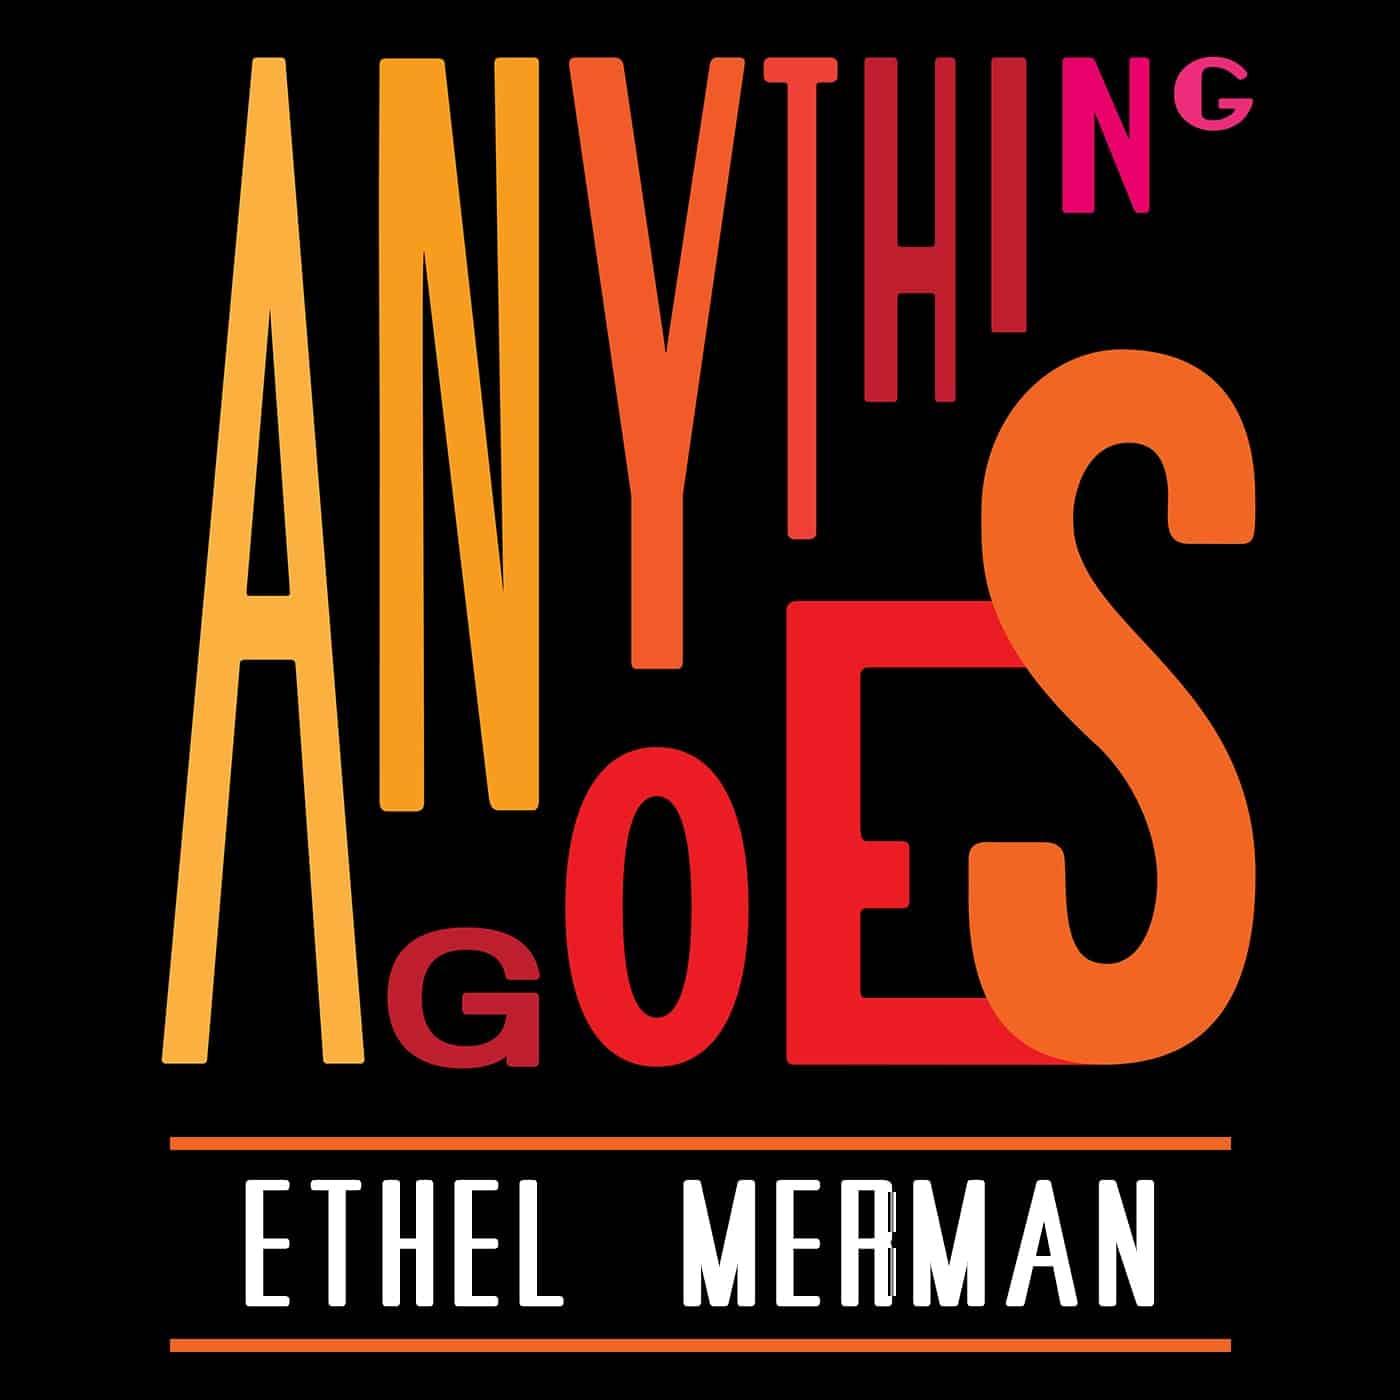 02 Ethel Merman